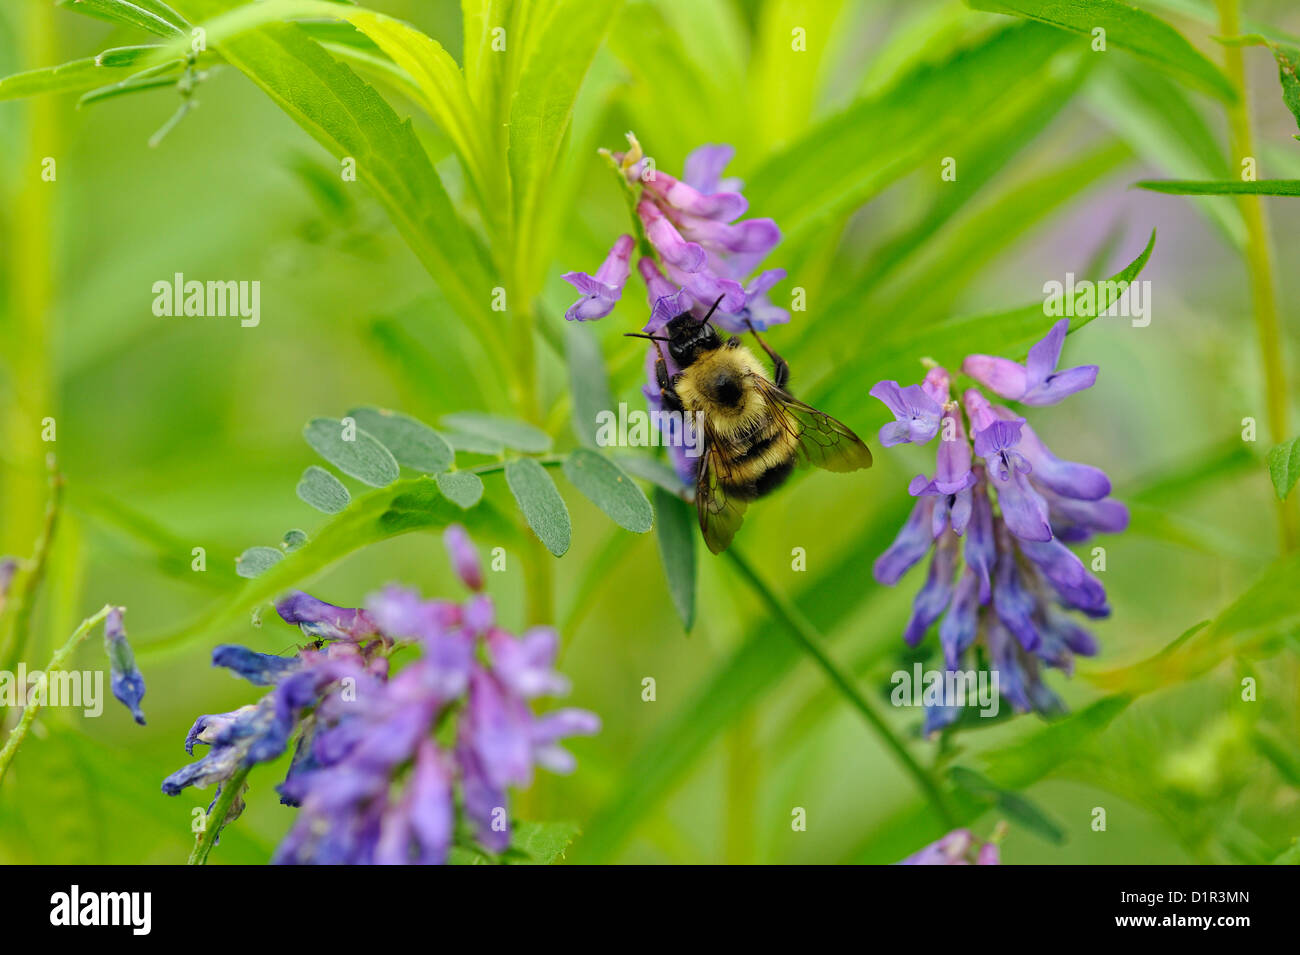 Bumblebeee (Bombus sp.) nectaring on wild vetch (Vicia spp.), Greater Sudbury , Ontario, Canada - Stock Image